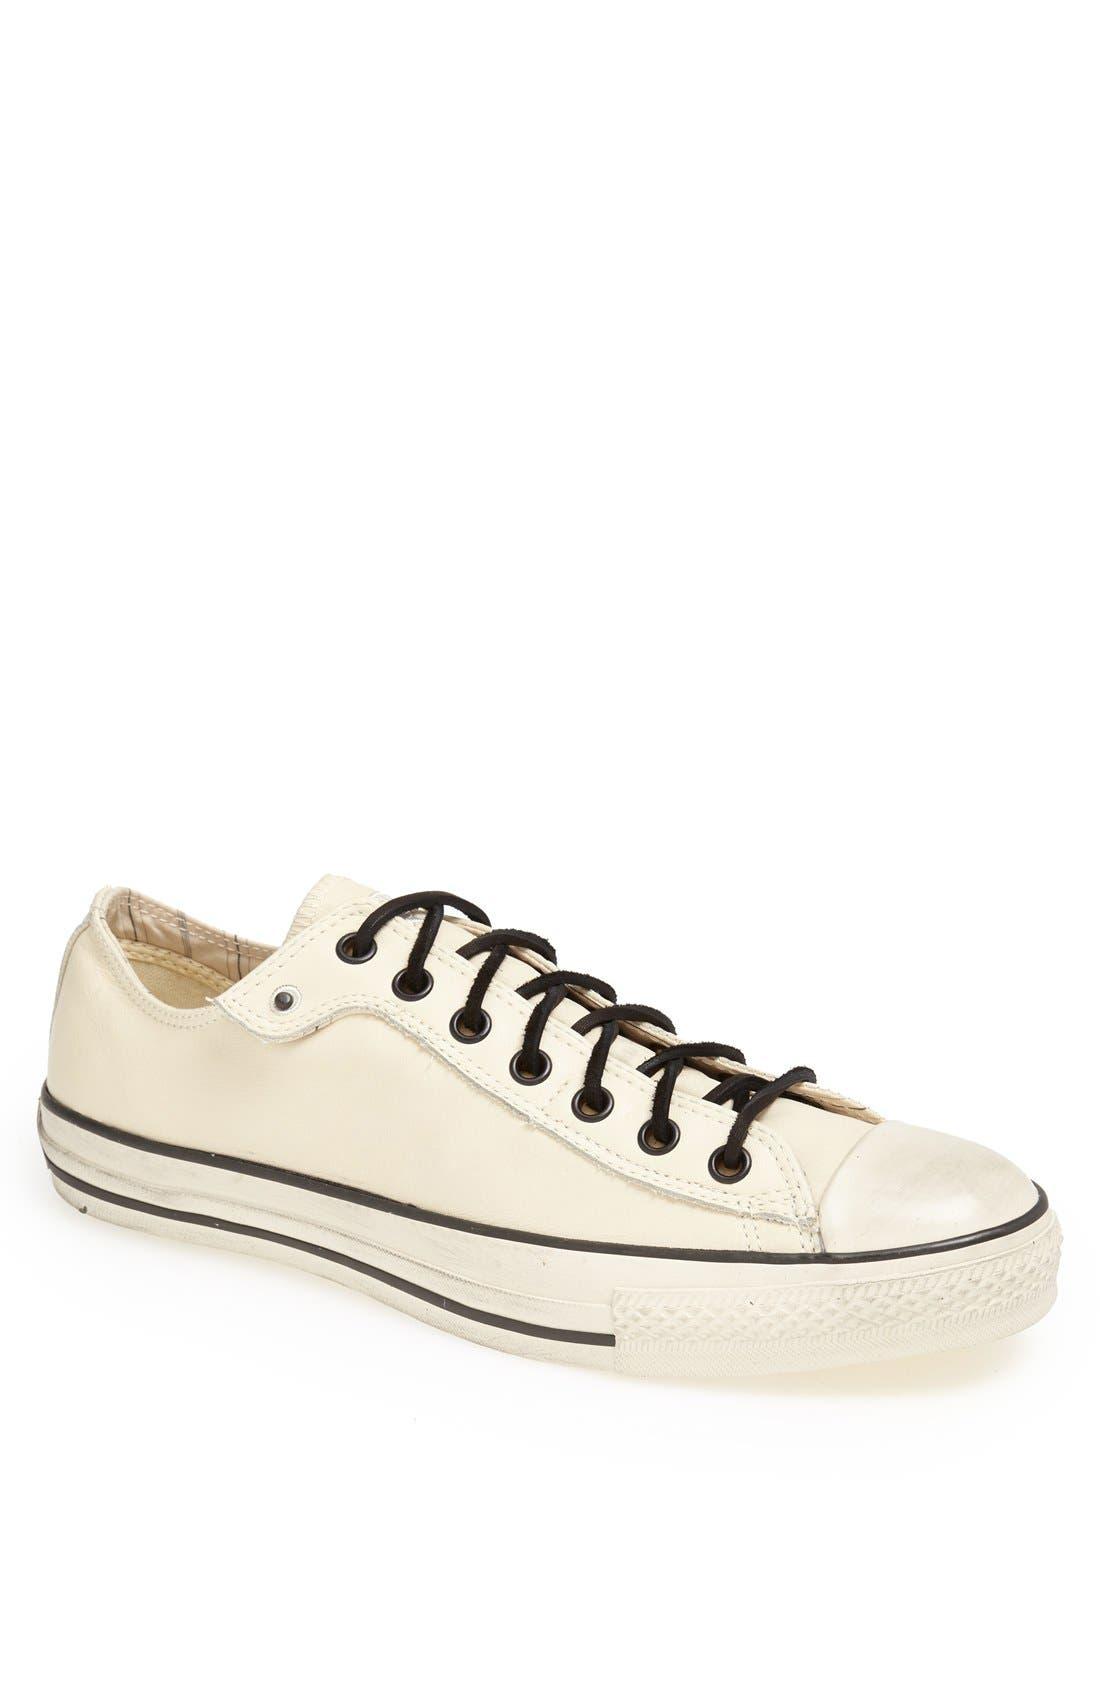 Main Image - Converse by John Varvatos Chuck Taylor® All Star® Sneaker